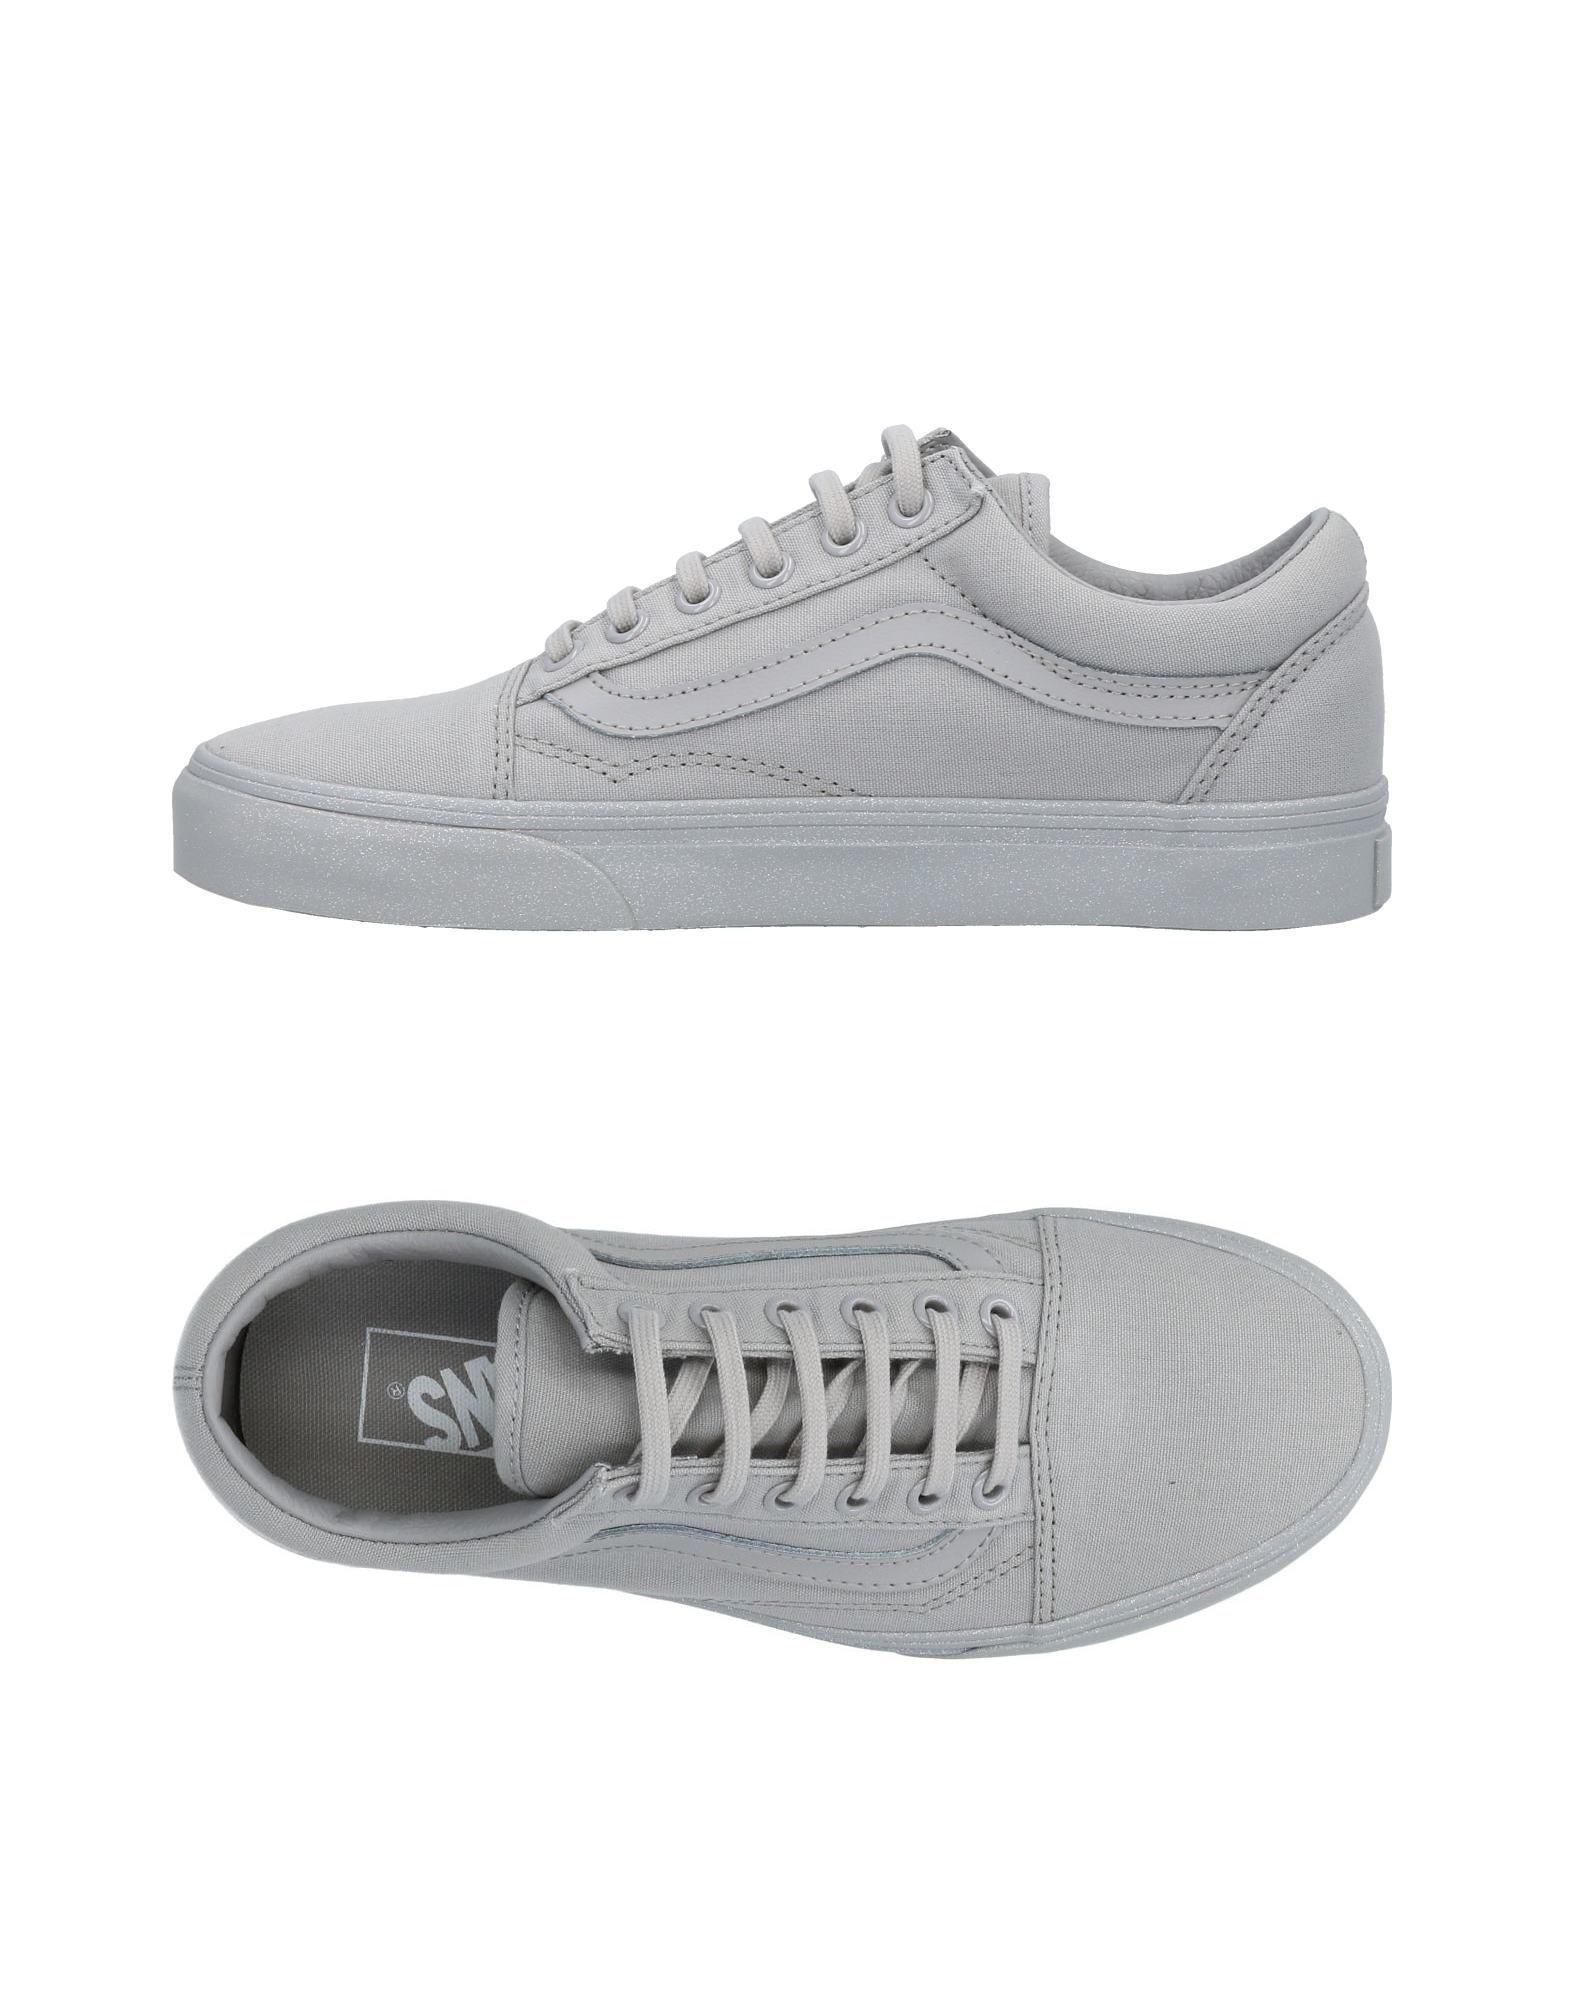 Vans Sneakers Damen  11494559XB Gute Qualität beliebte Schuhe